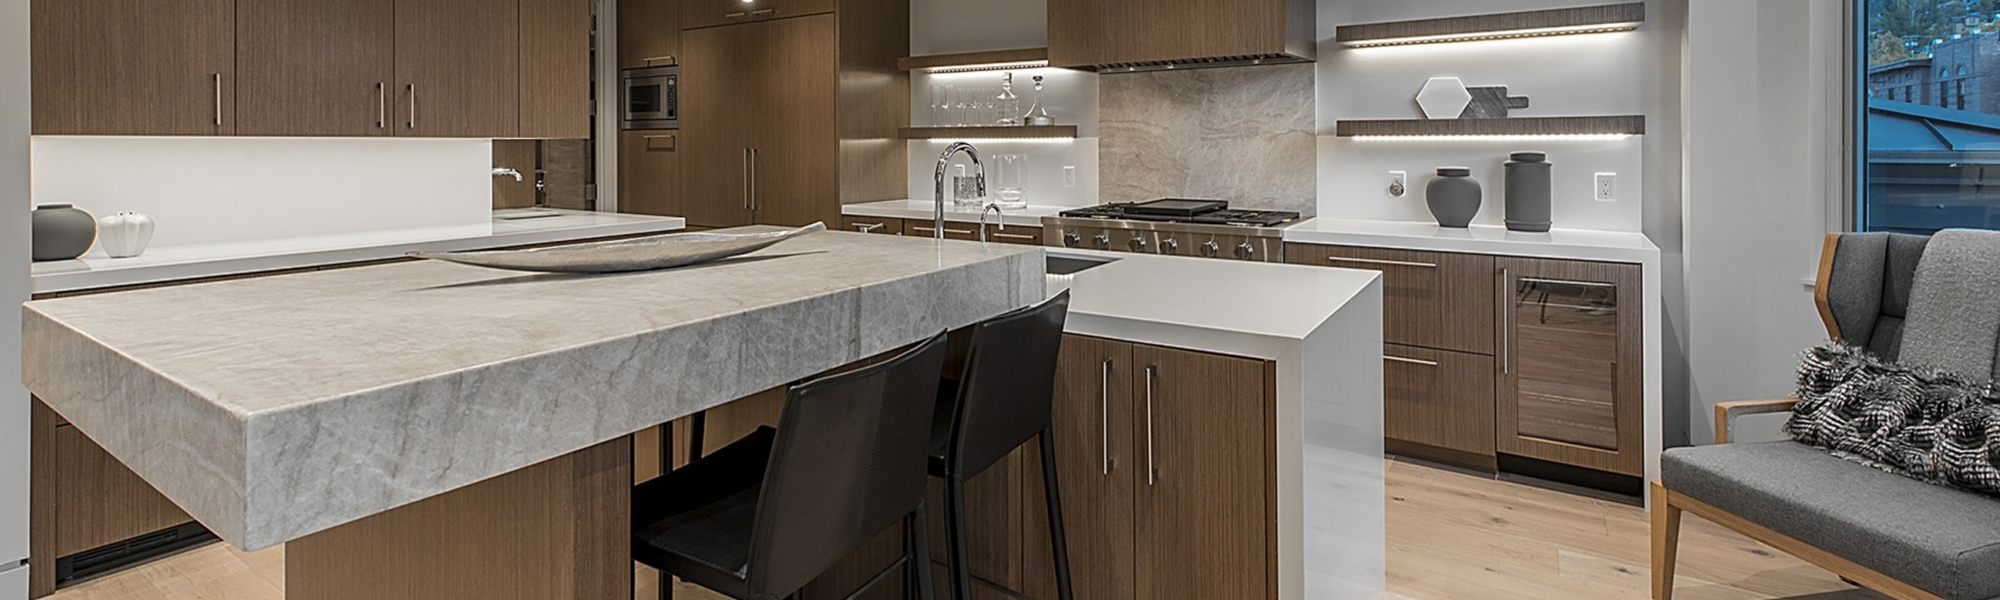 Remarkable Anvil Appliance Cabinets Insalt Lake City Brigham City Ut Home Interior And Landscaping Ologienasavecom